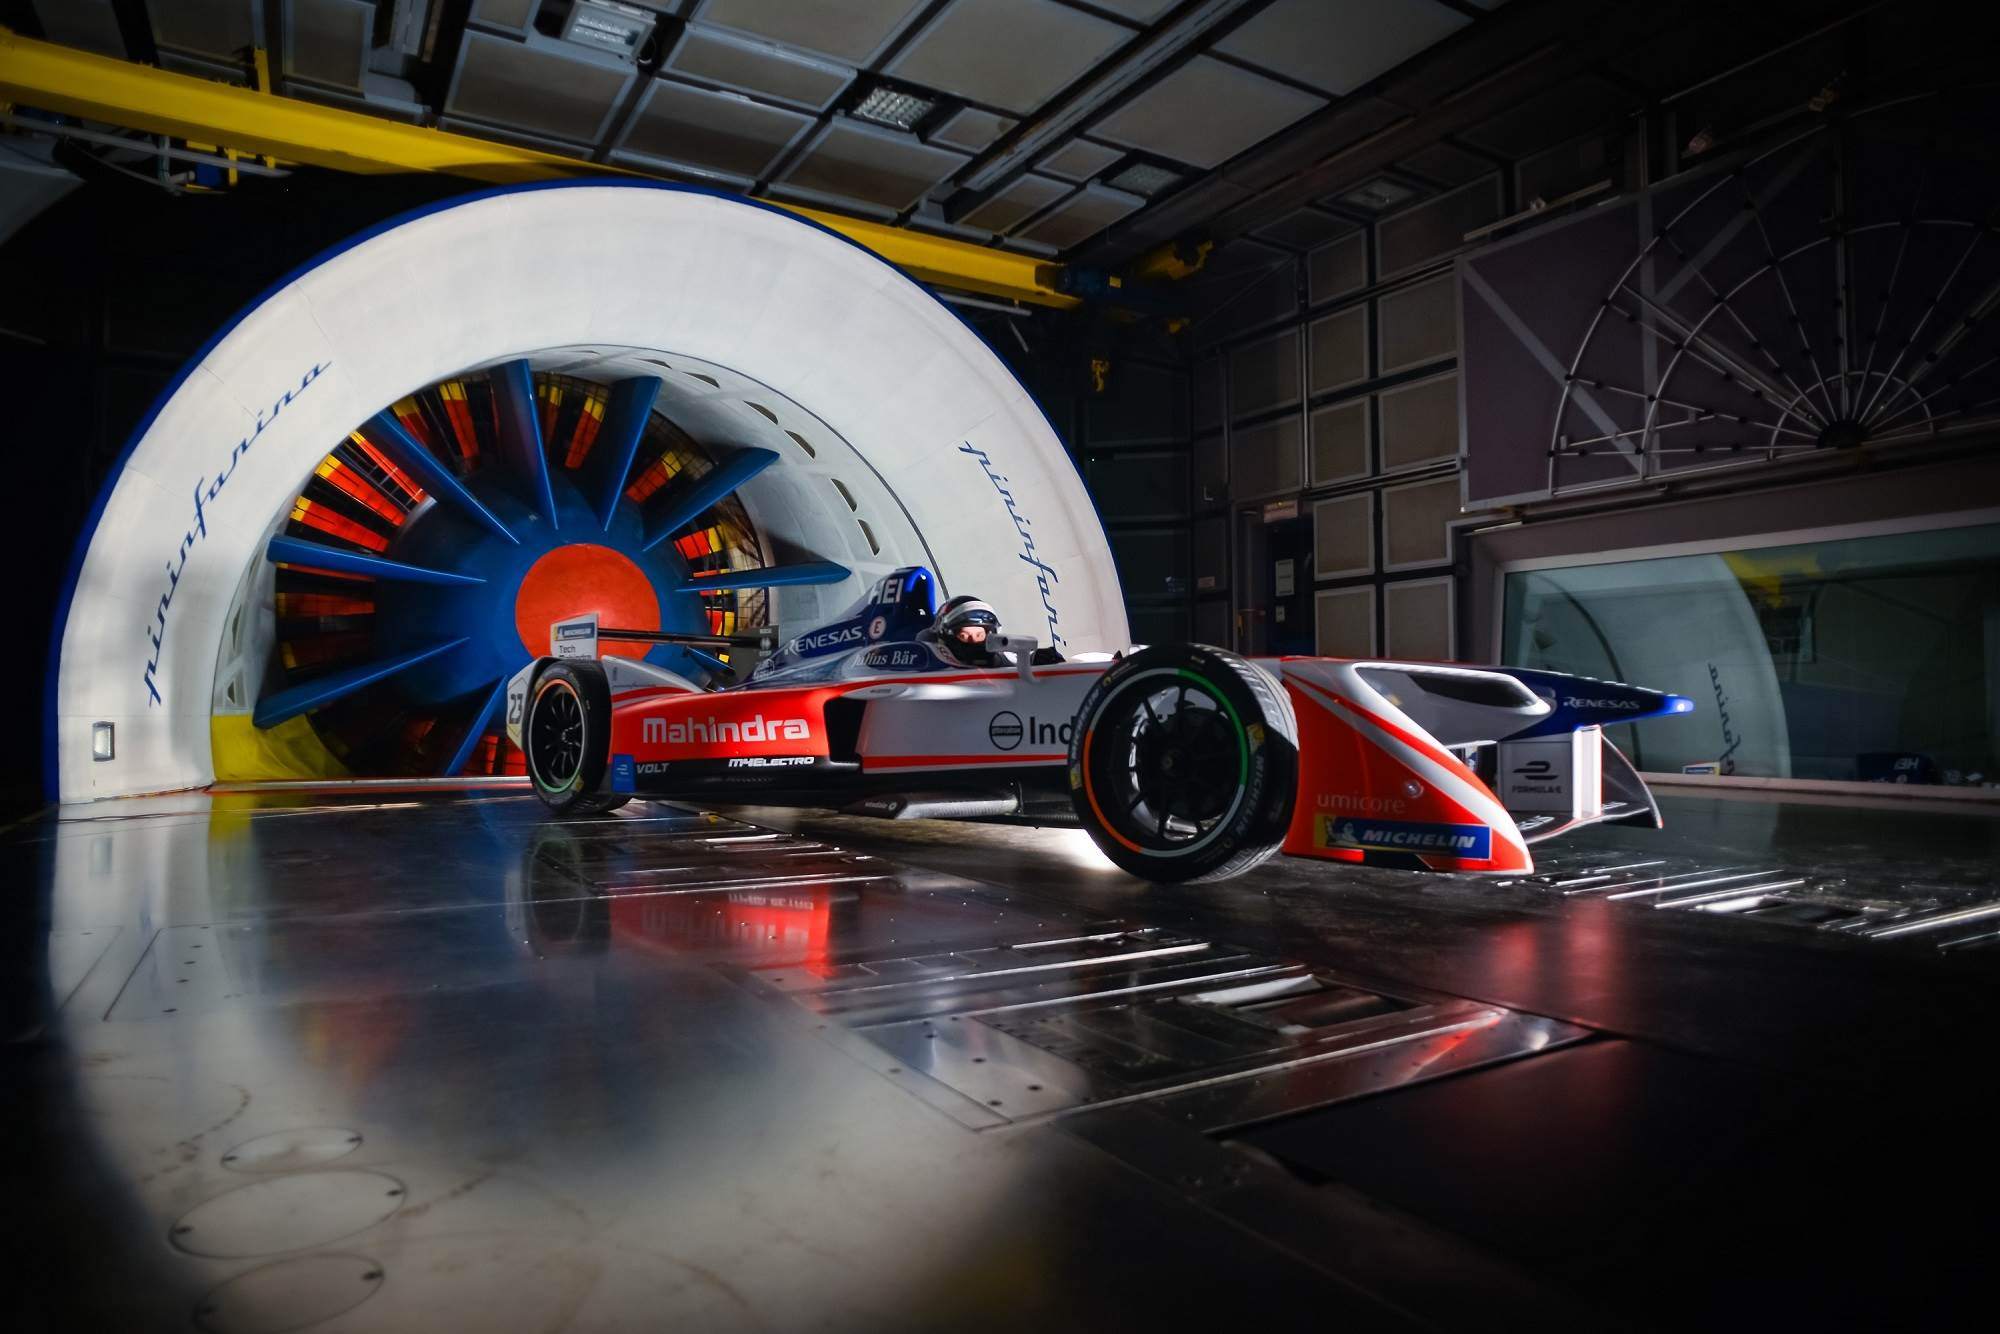 Pininfarina to develop Mahindra's Season 5 Formula E car